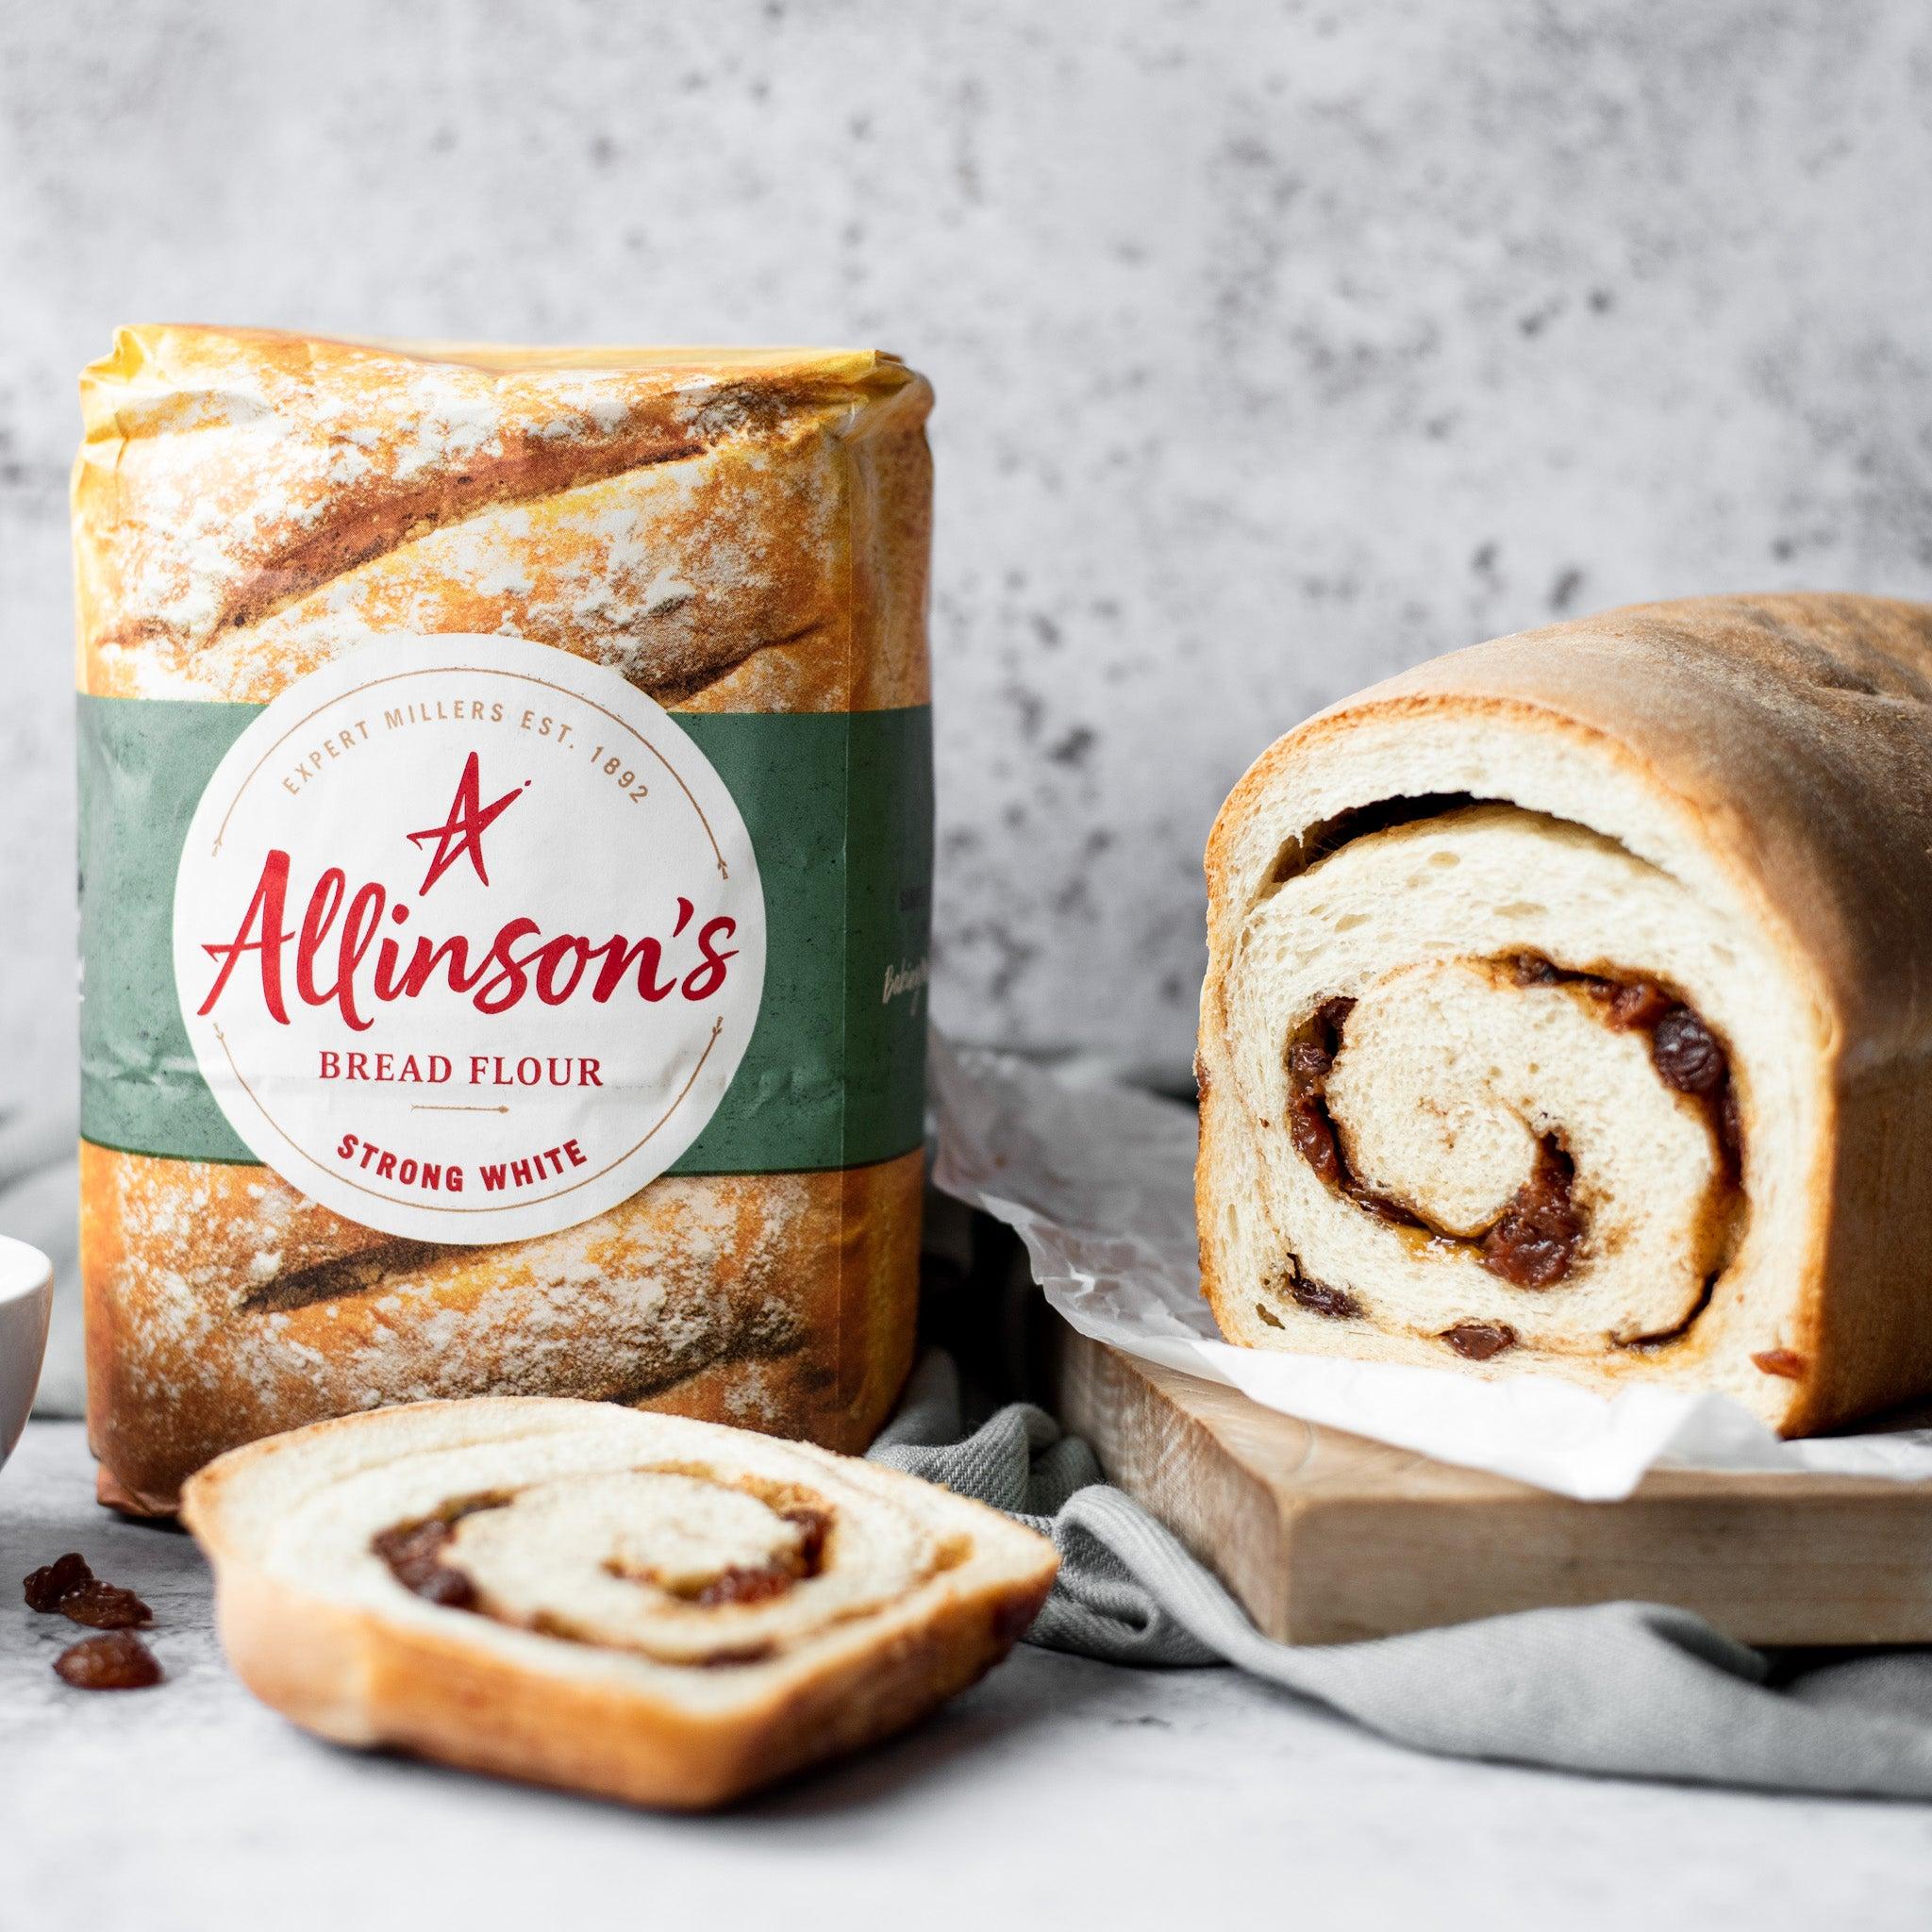 Cinnamon & Raisin Swirl Bread